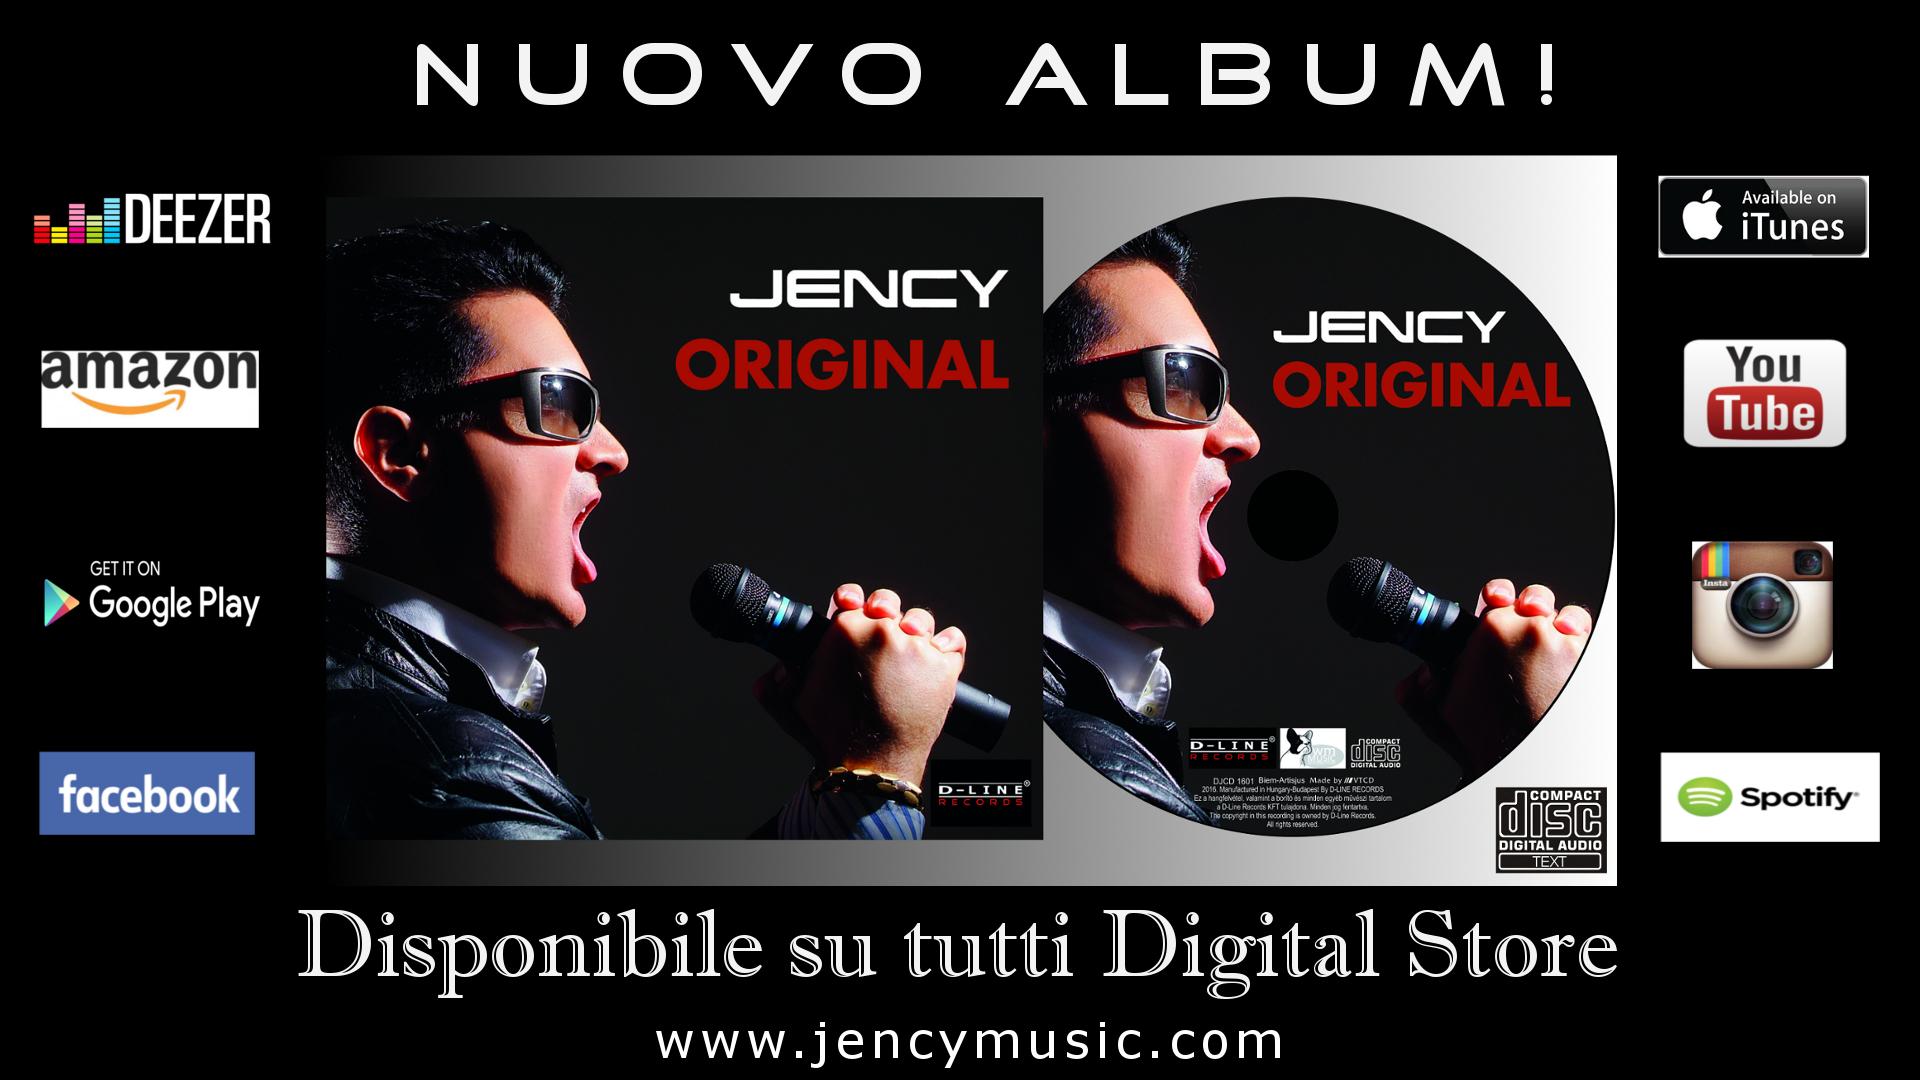 új album+logok olasz